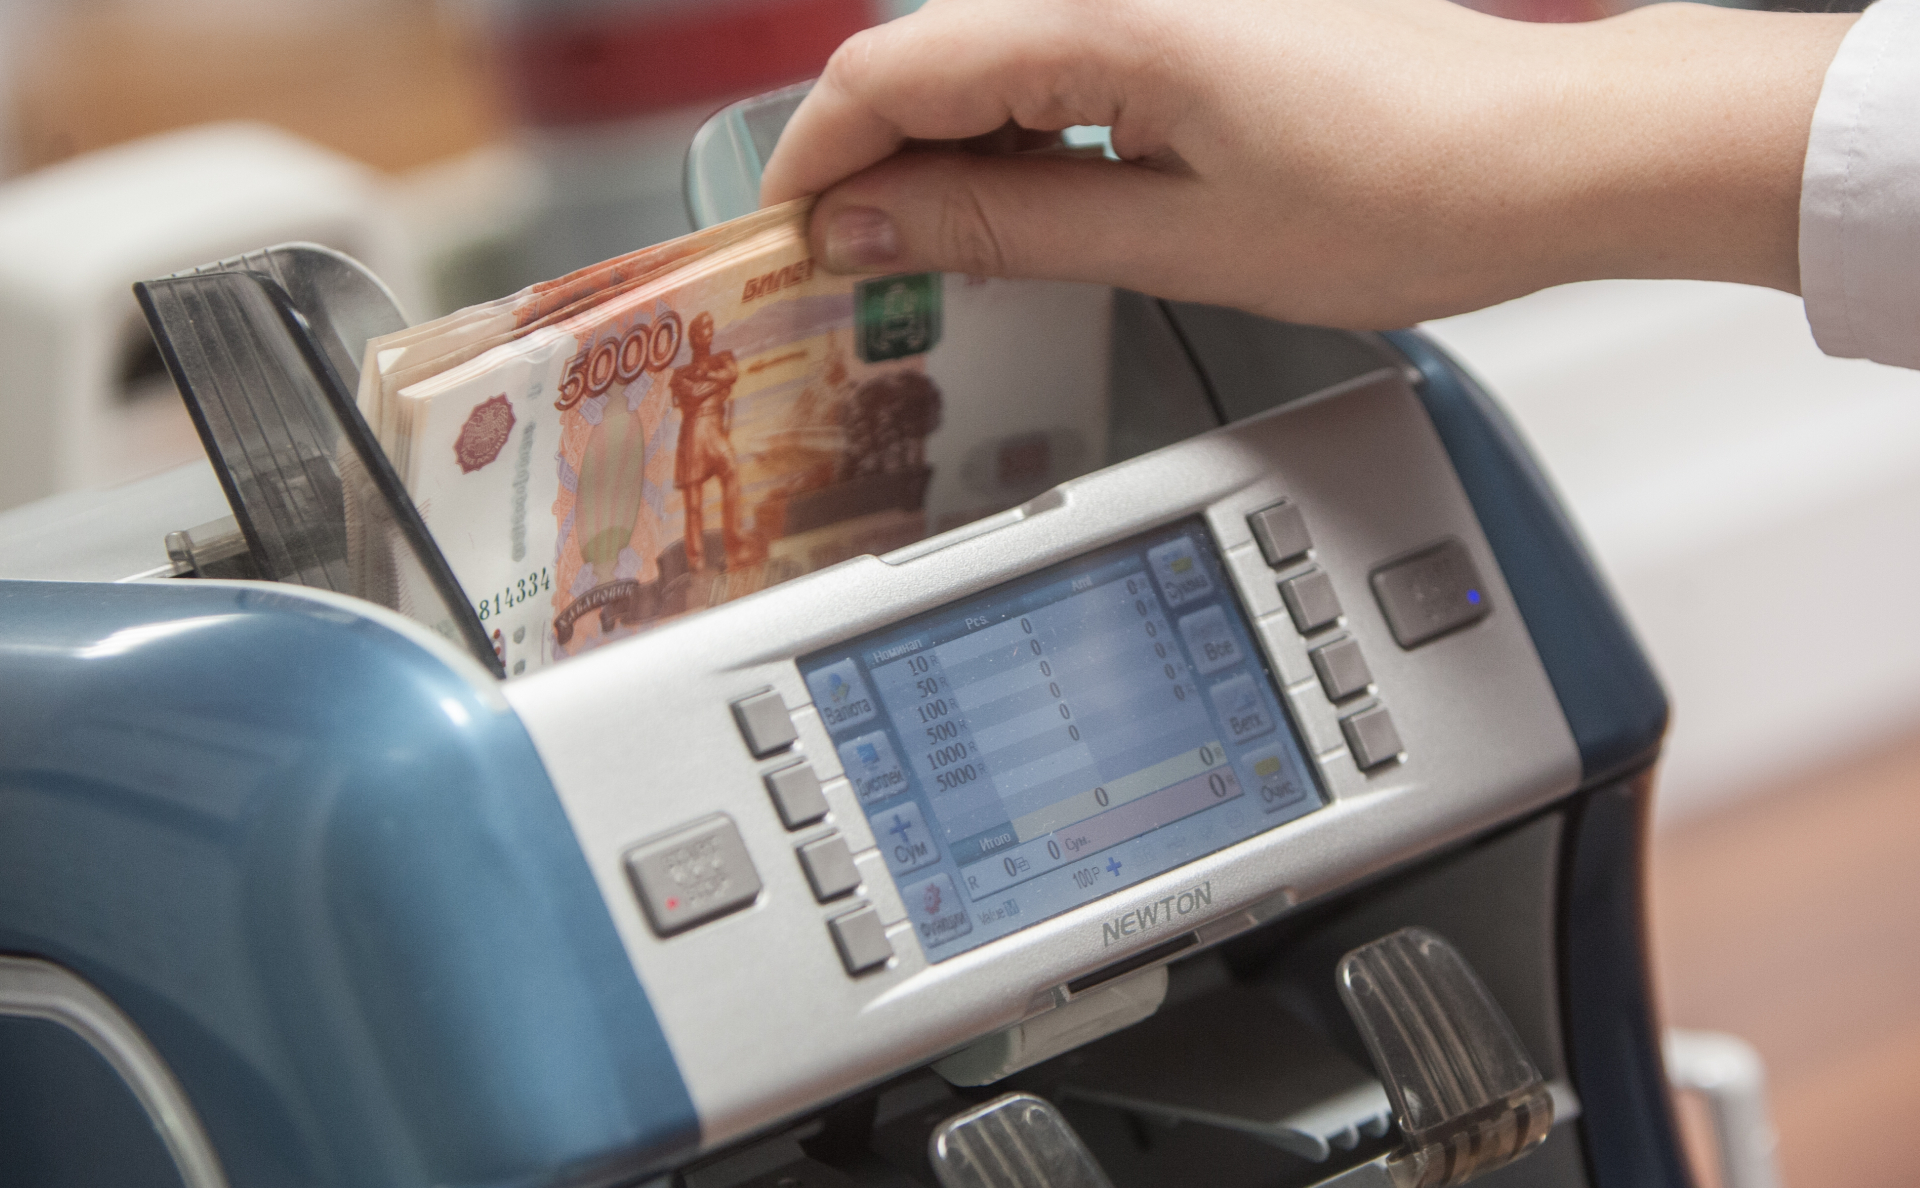 Аппарат для счета денег